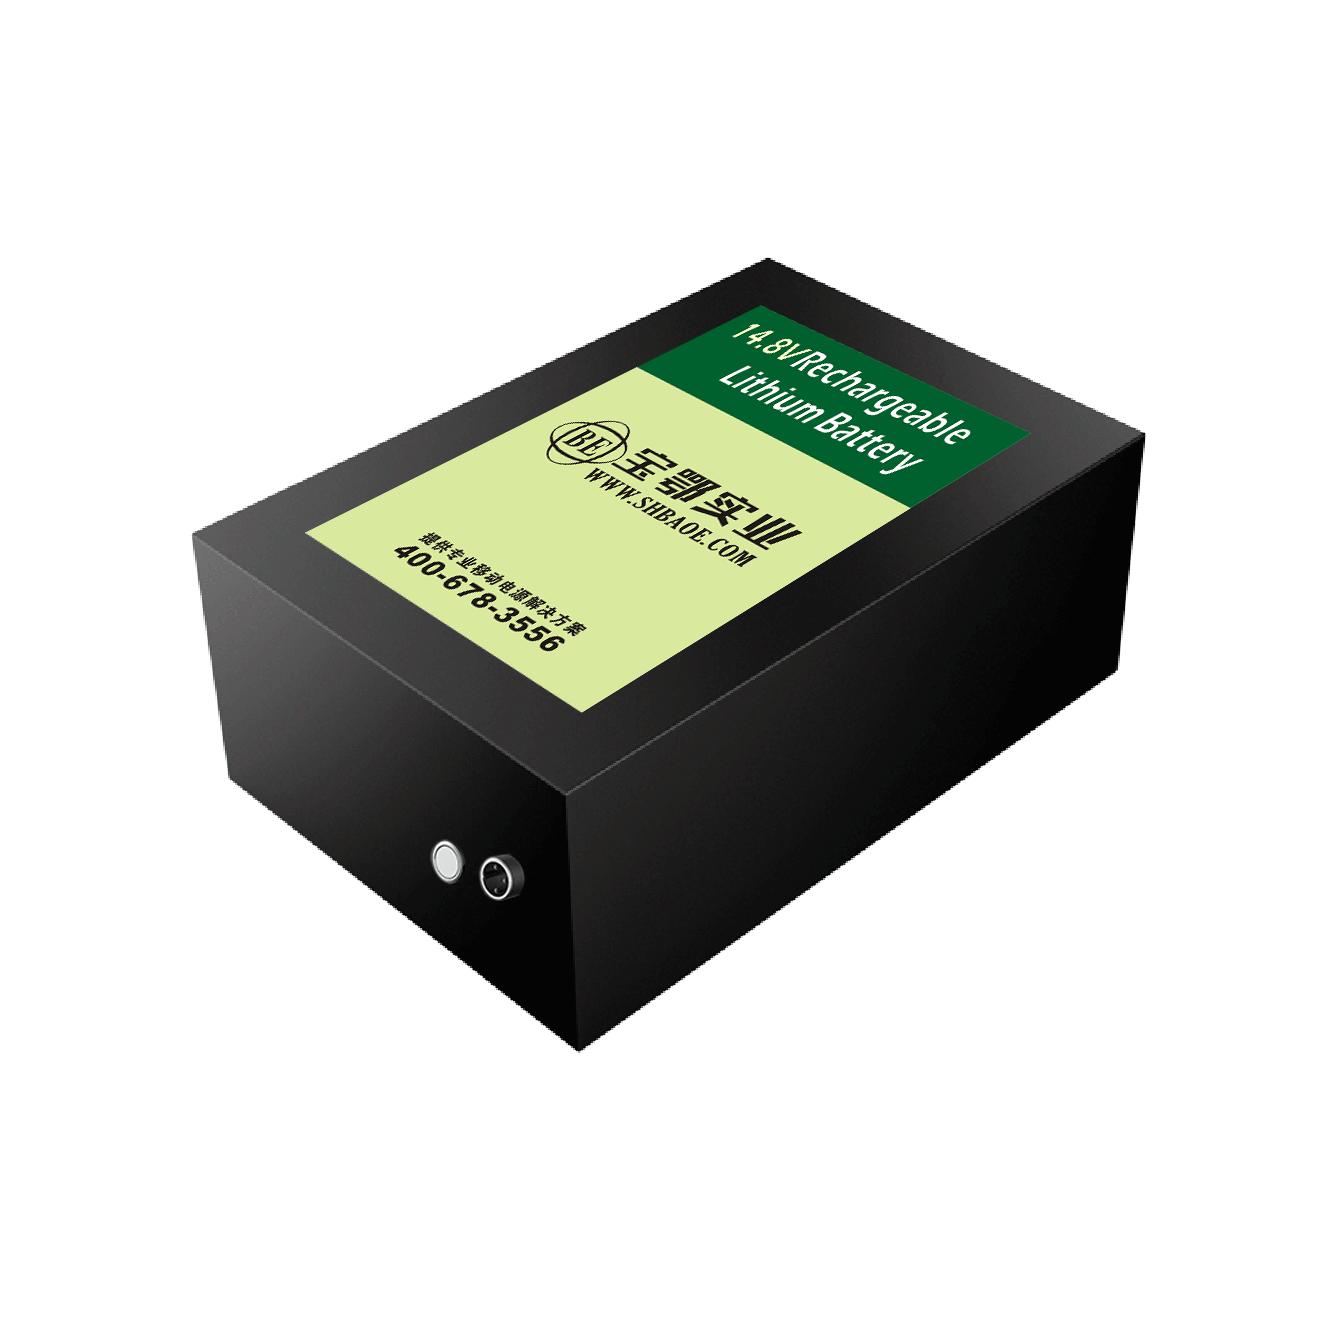 12.8V 9Ah 26650 银行自助设备磷酸铁锂电池